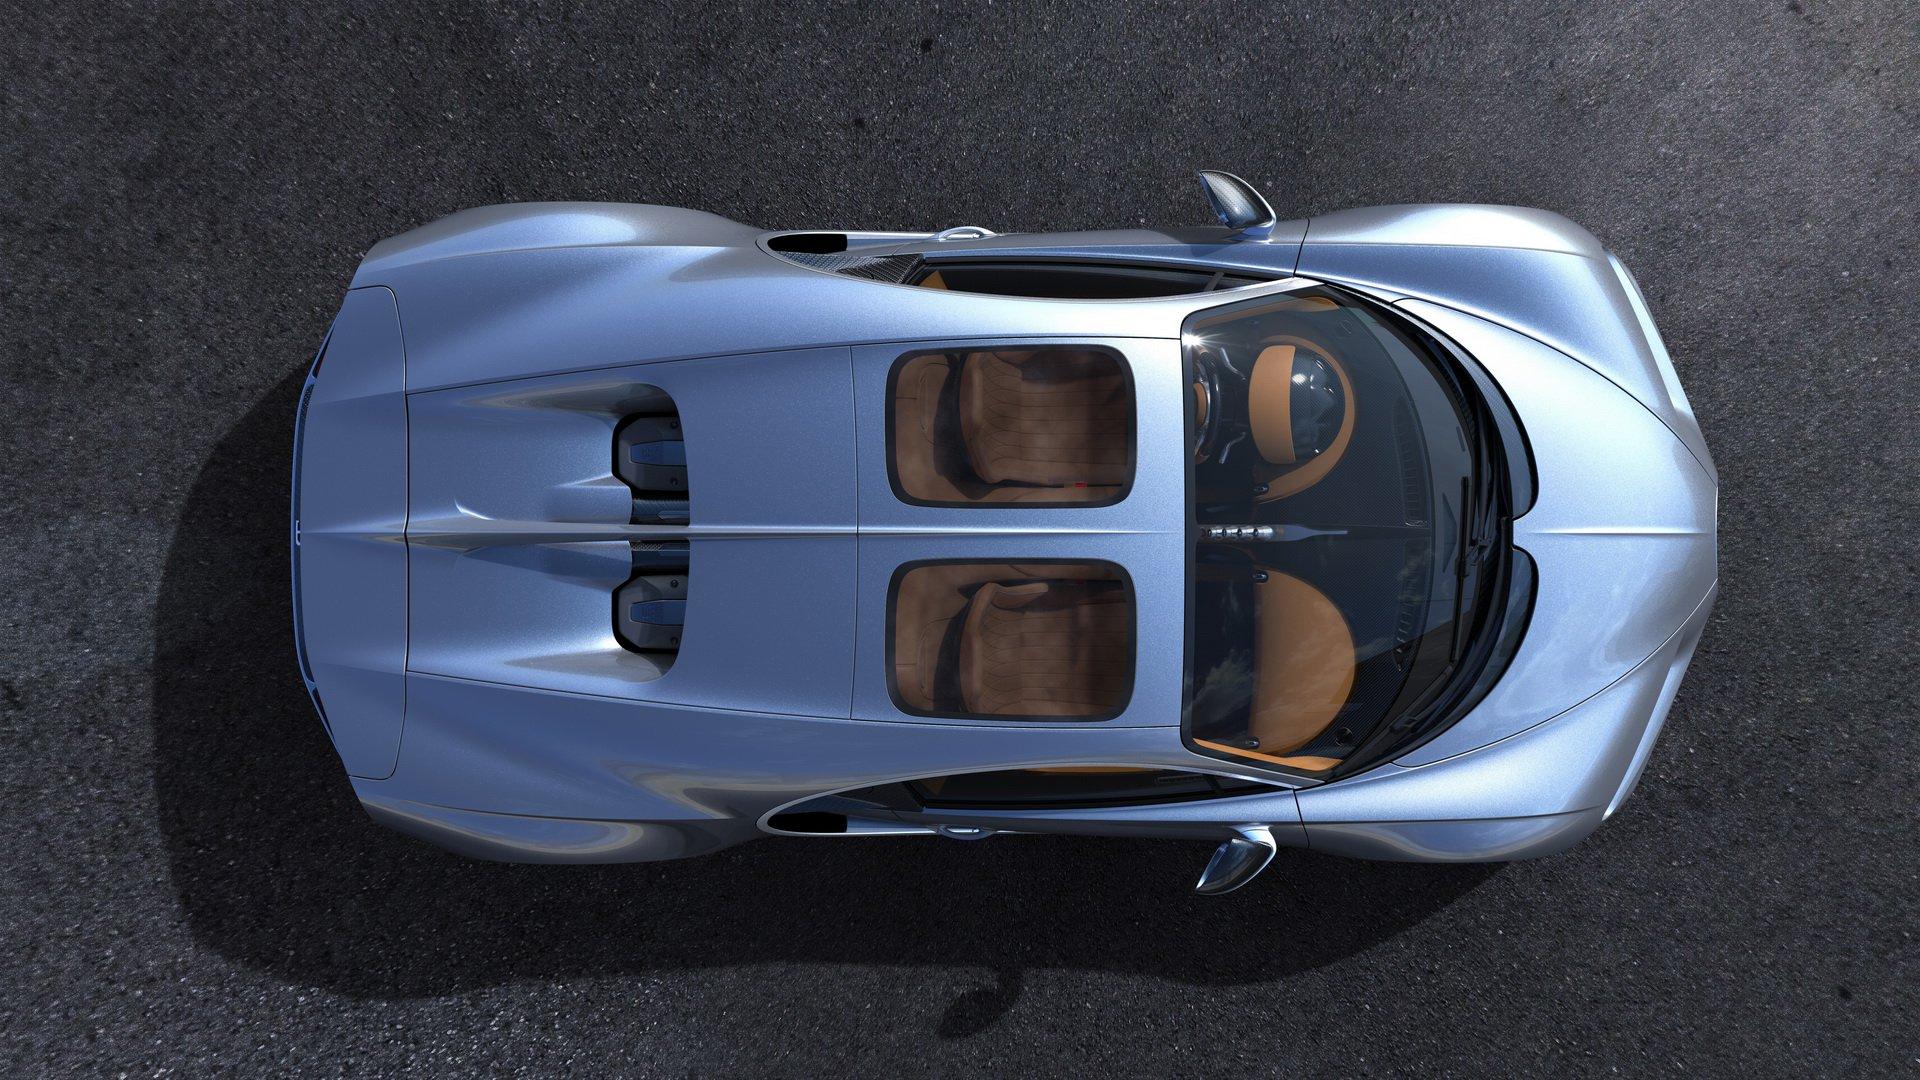 Bugatti Chiron Sky View glass roof (4)